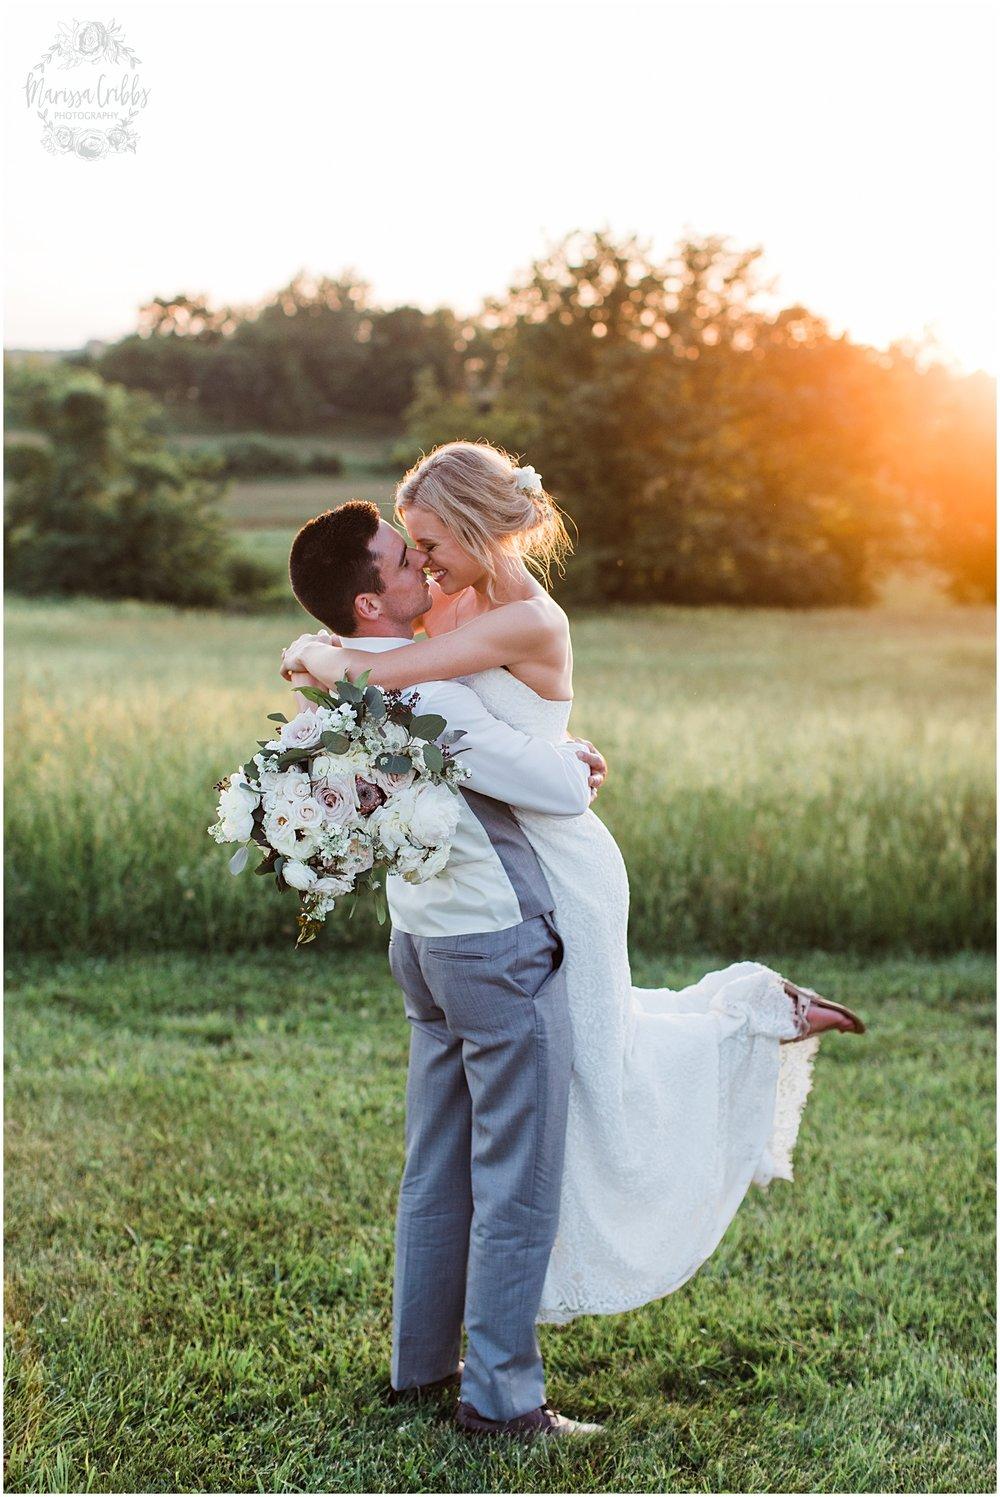 RHODES WEDDING | WESTON RED BARN FARM | MARISSA CRIBBS PHOTOGRAPHY_5322.jpg